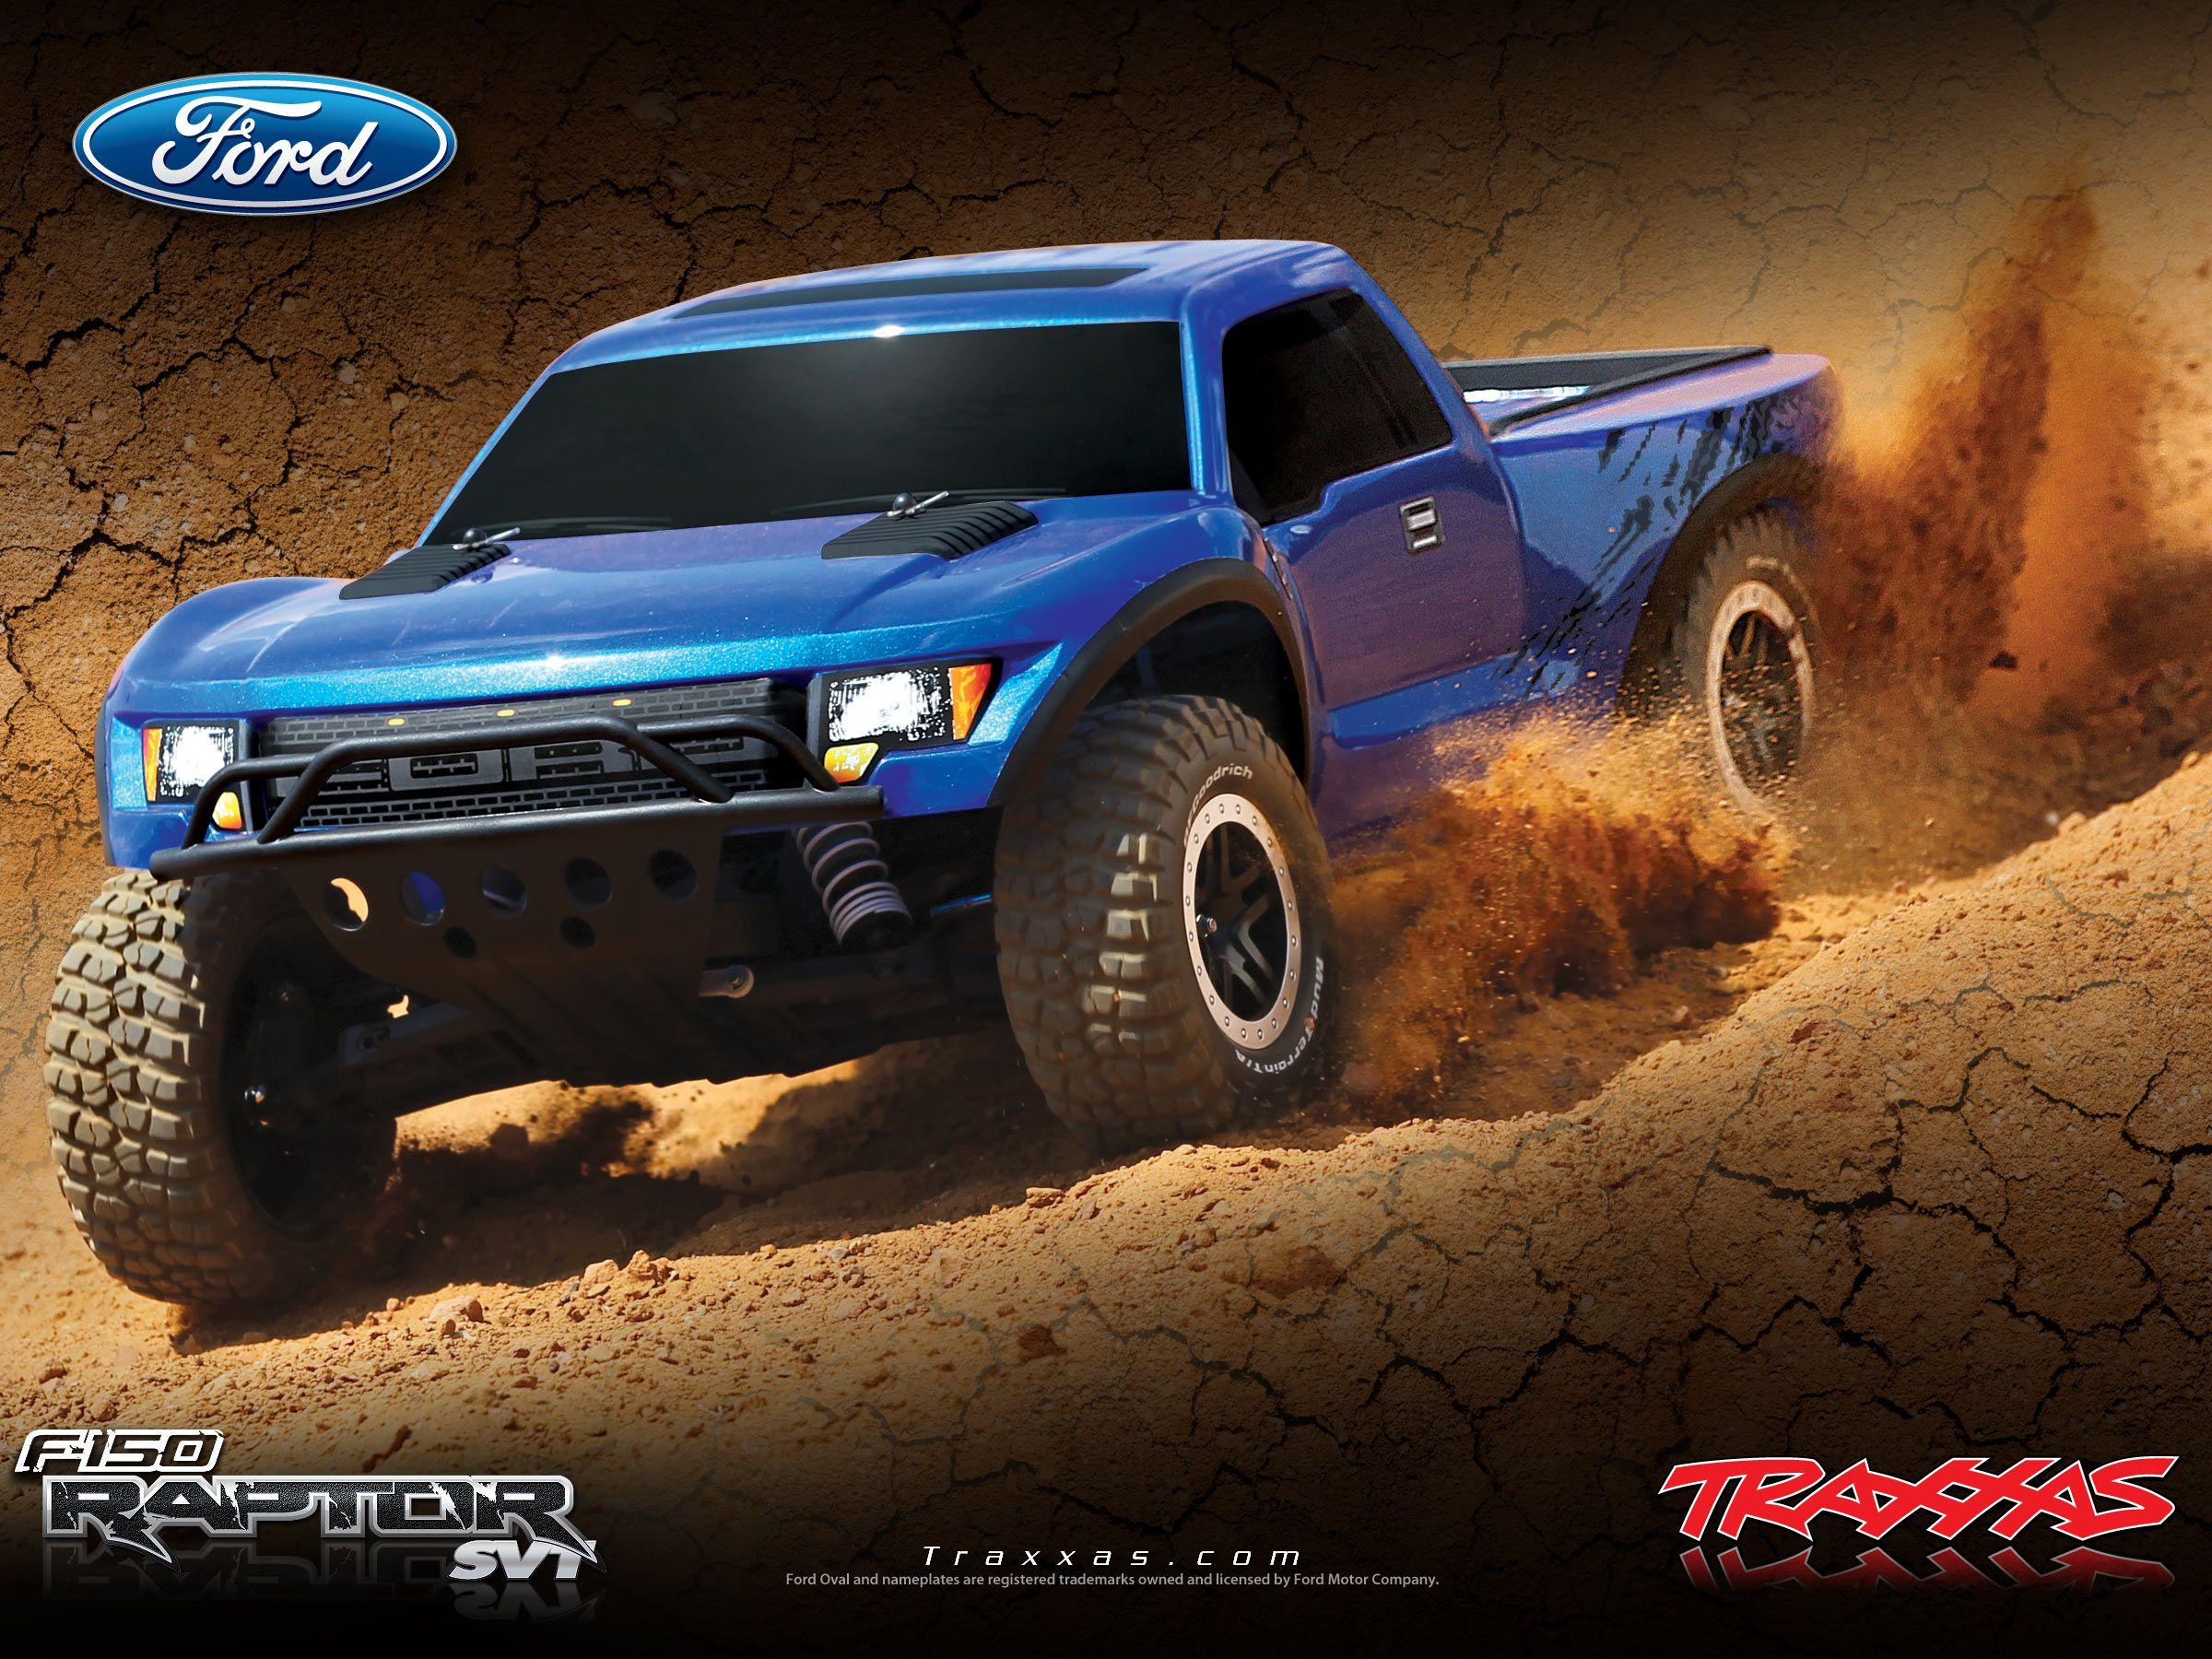 Ford svt f150 raptor hd wallpapers desktop 345 wallpaper